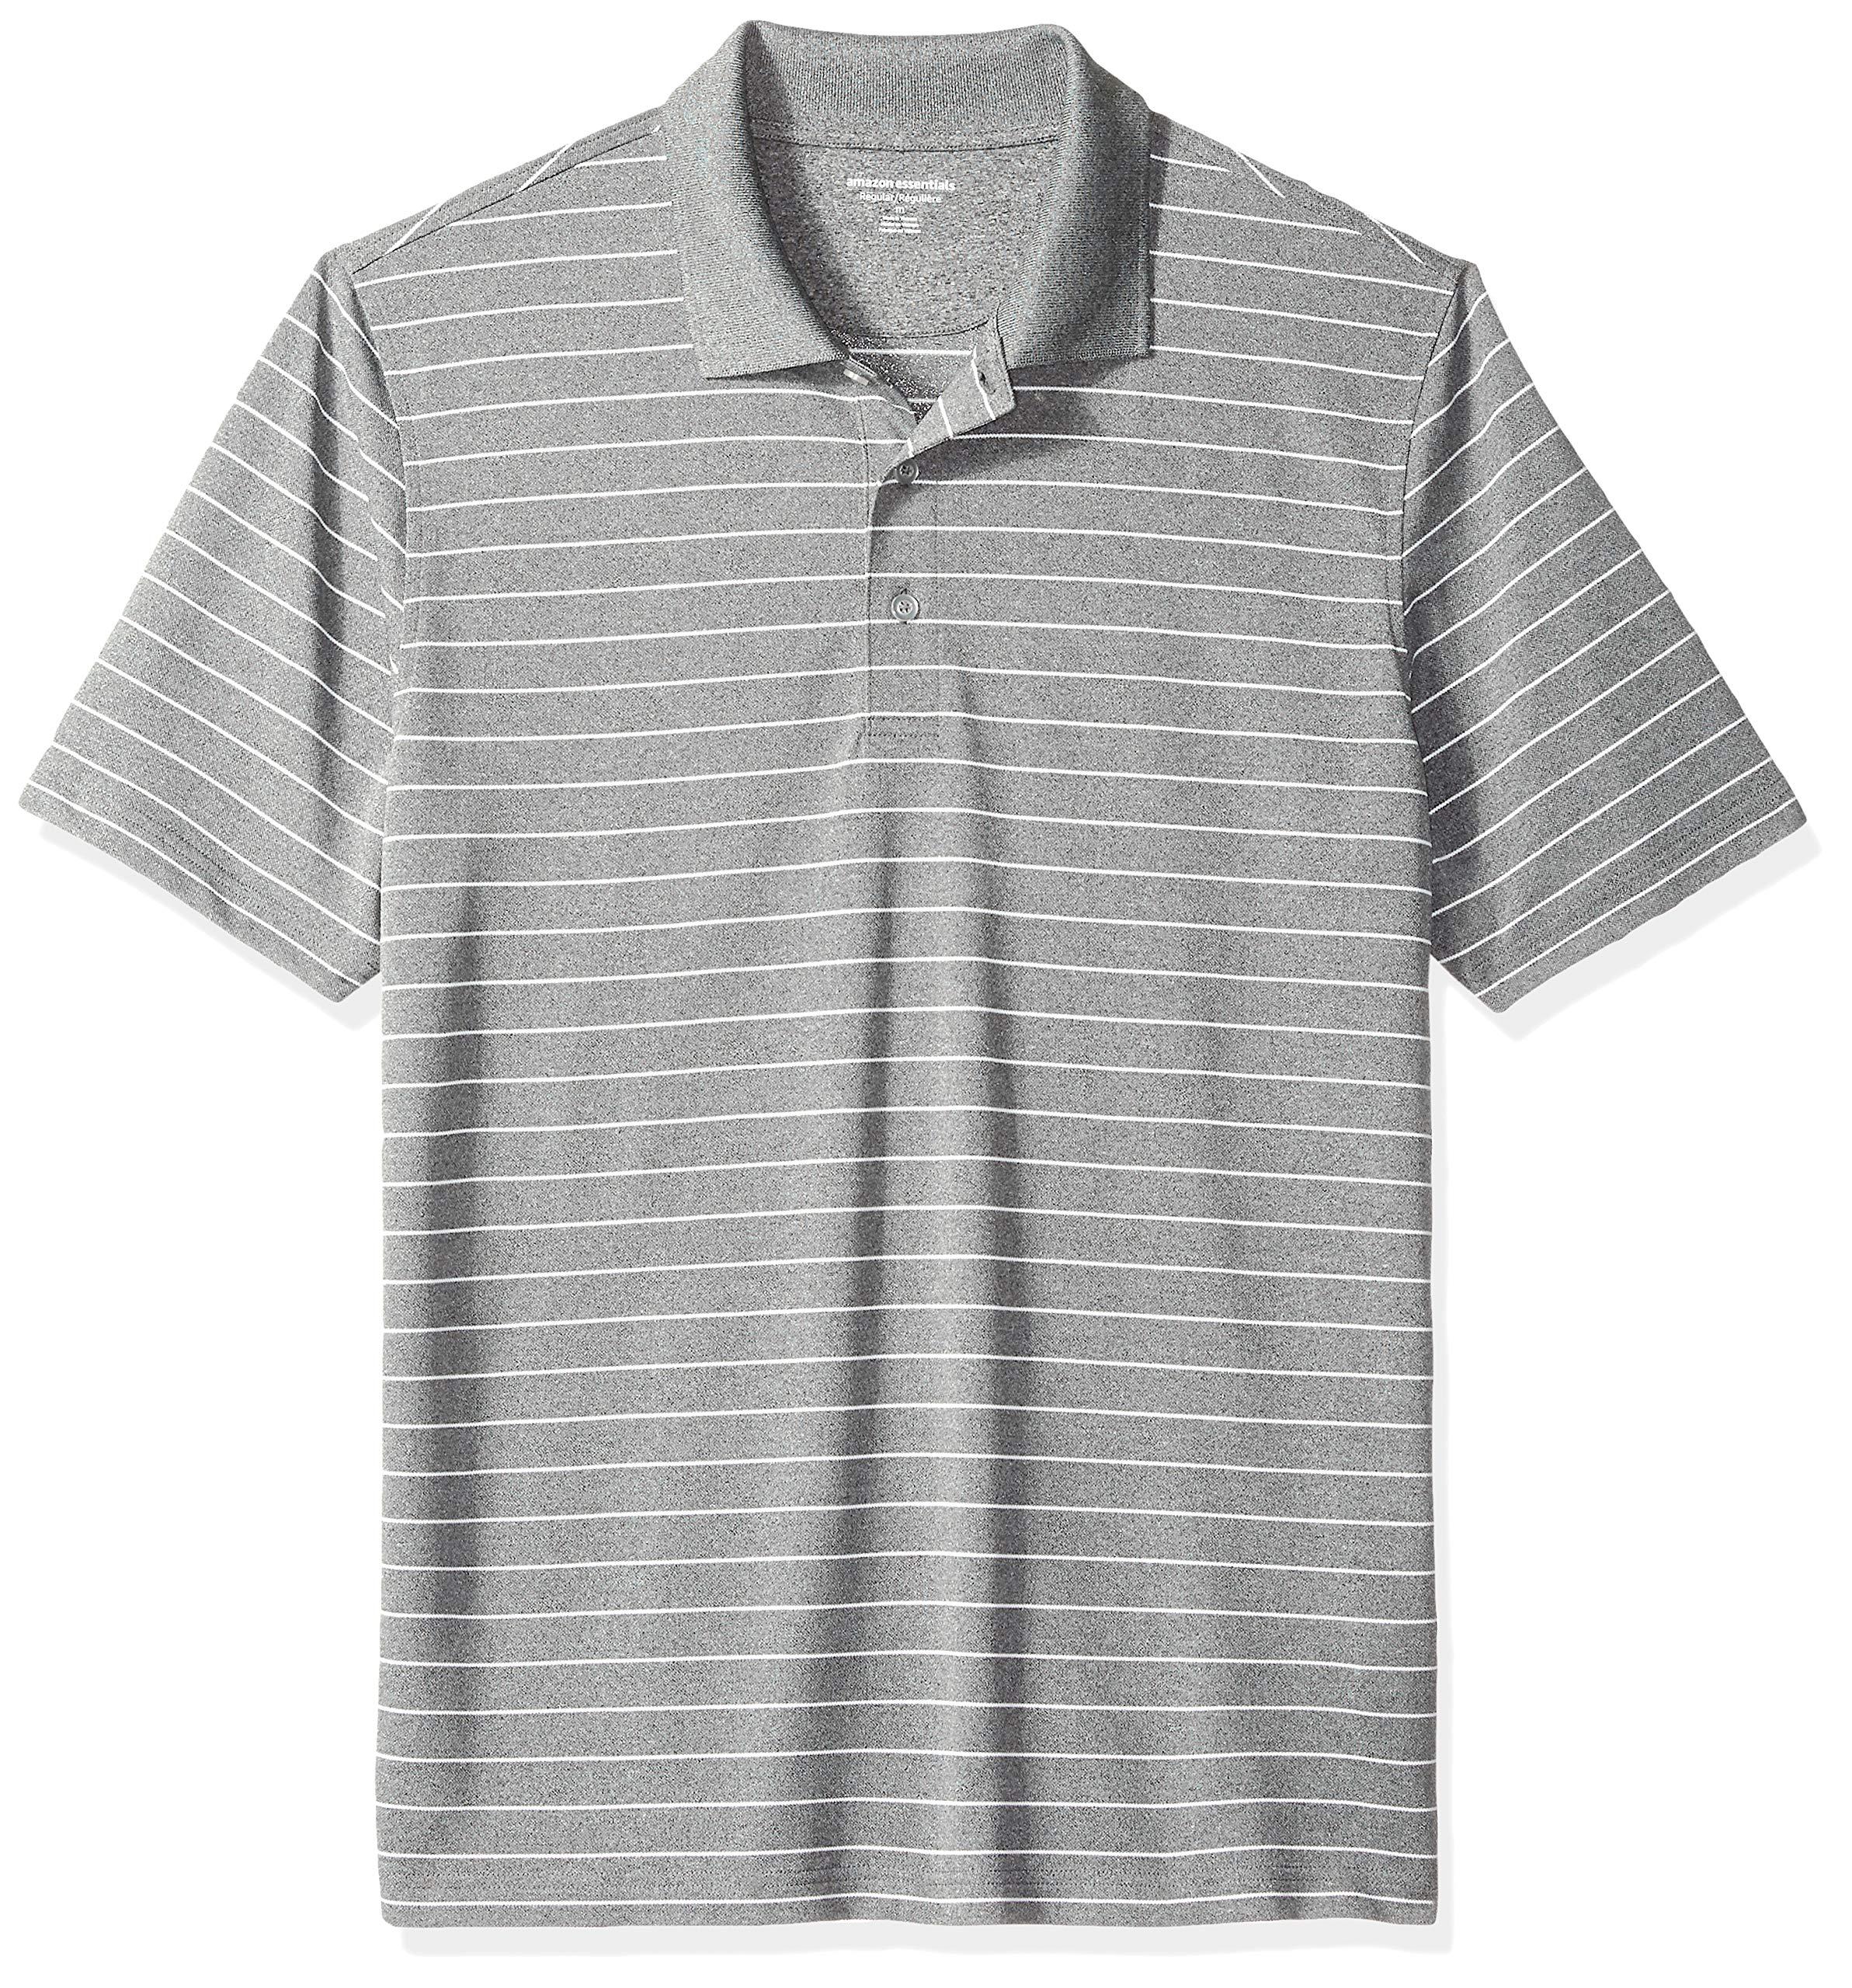 Amazon Essentials Men's Regular-Fit Quick-Dry Golf Polo Shirt, Medium Grey Heather Stripe, X-Small